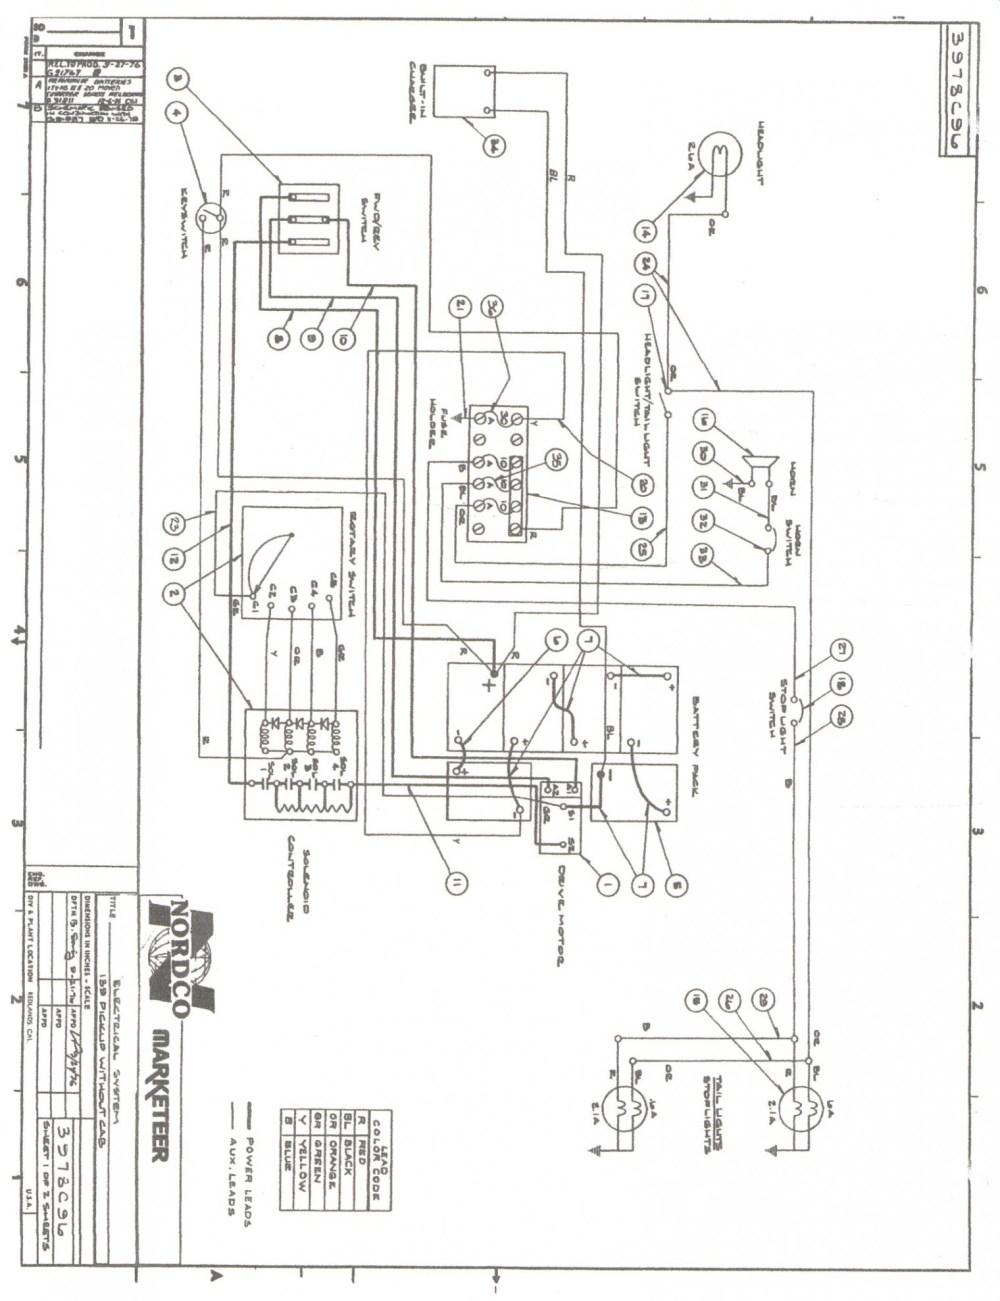 medium resolution of  ezgo golf cart wiring diagram 36 volt 1998 auto electrical wiring western golf cart wiring